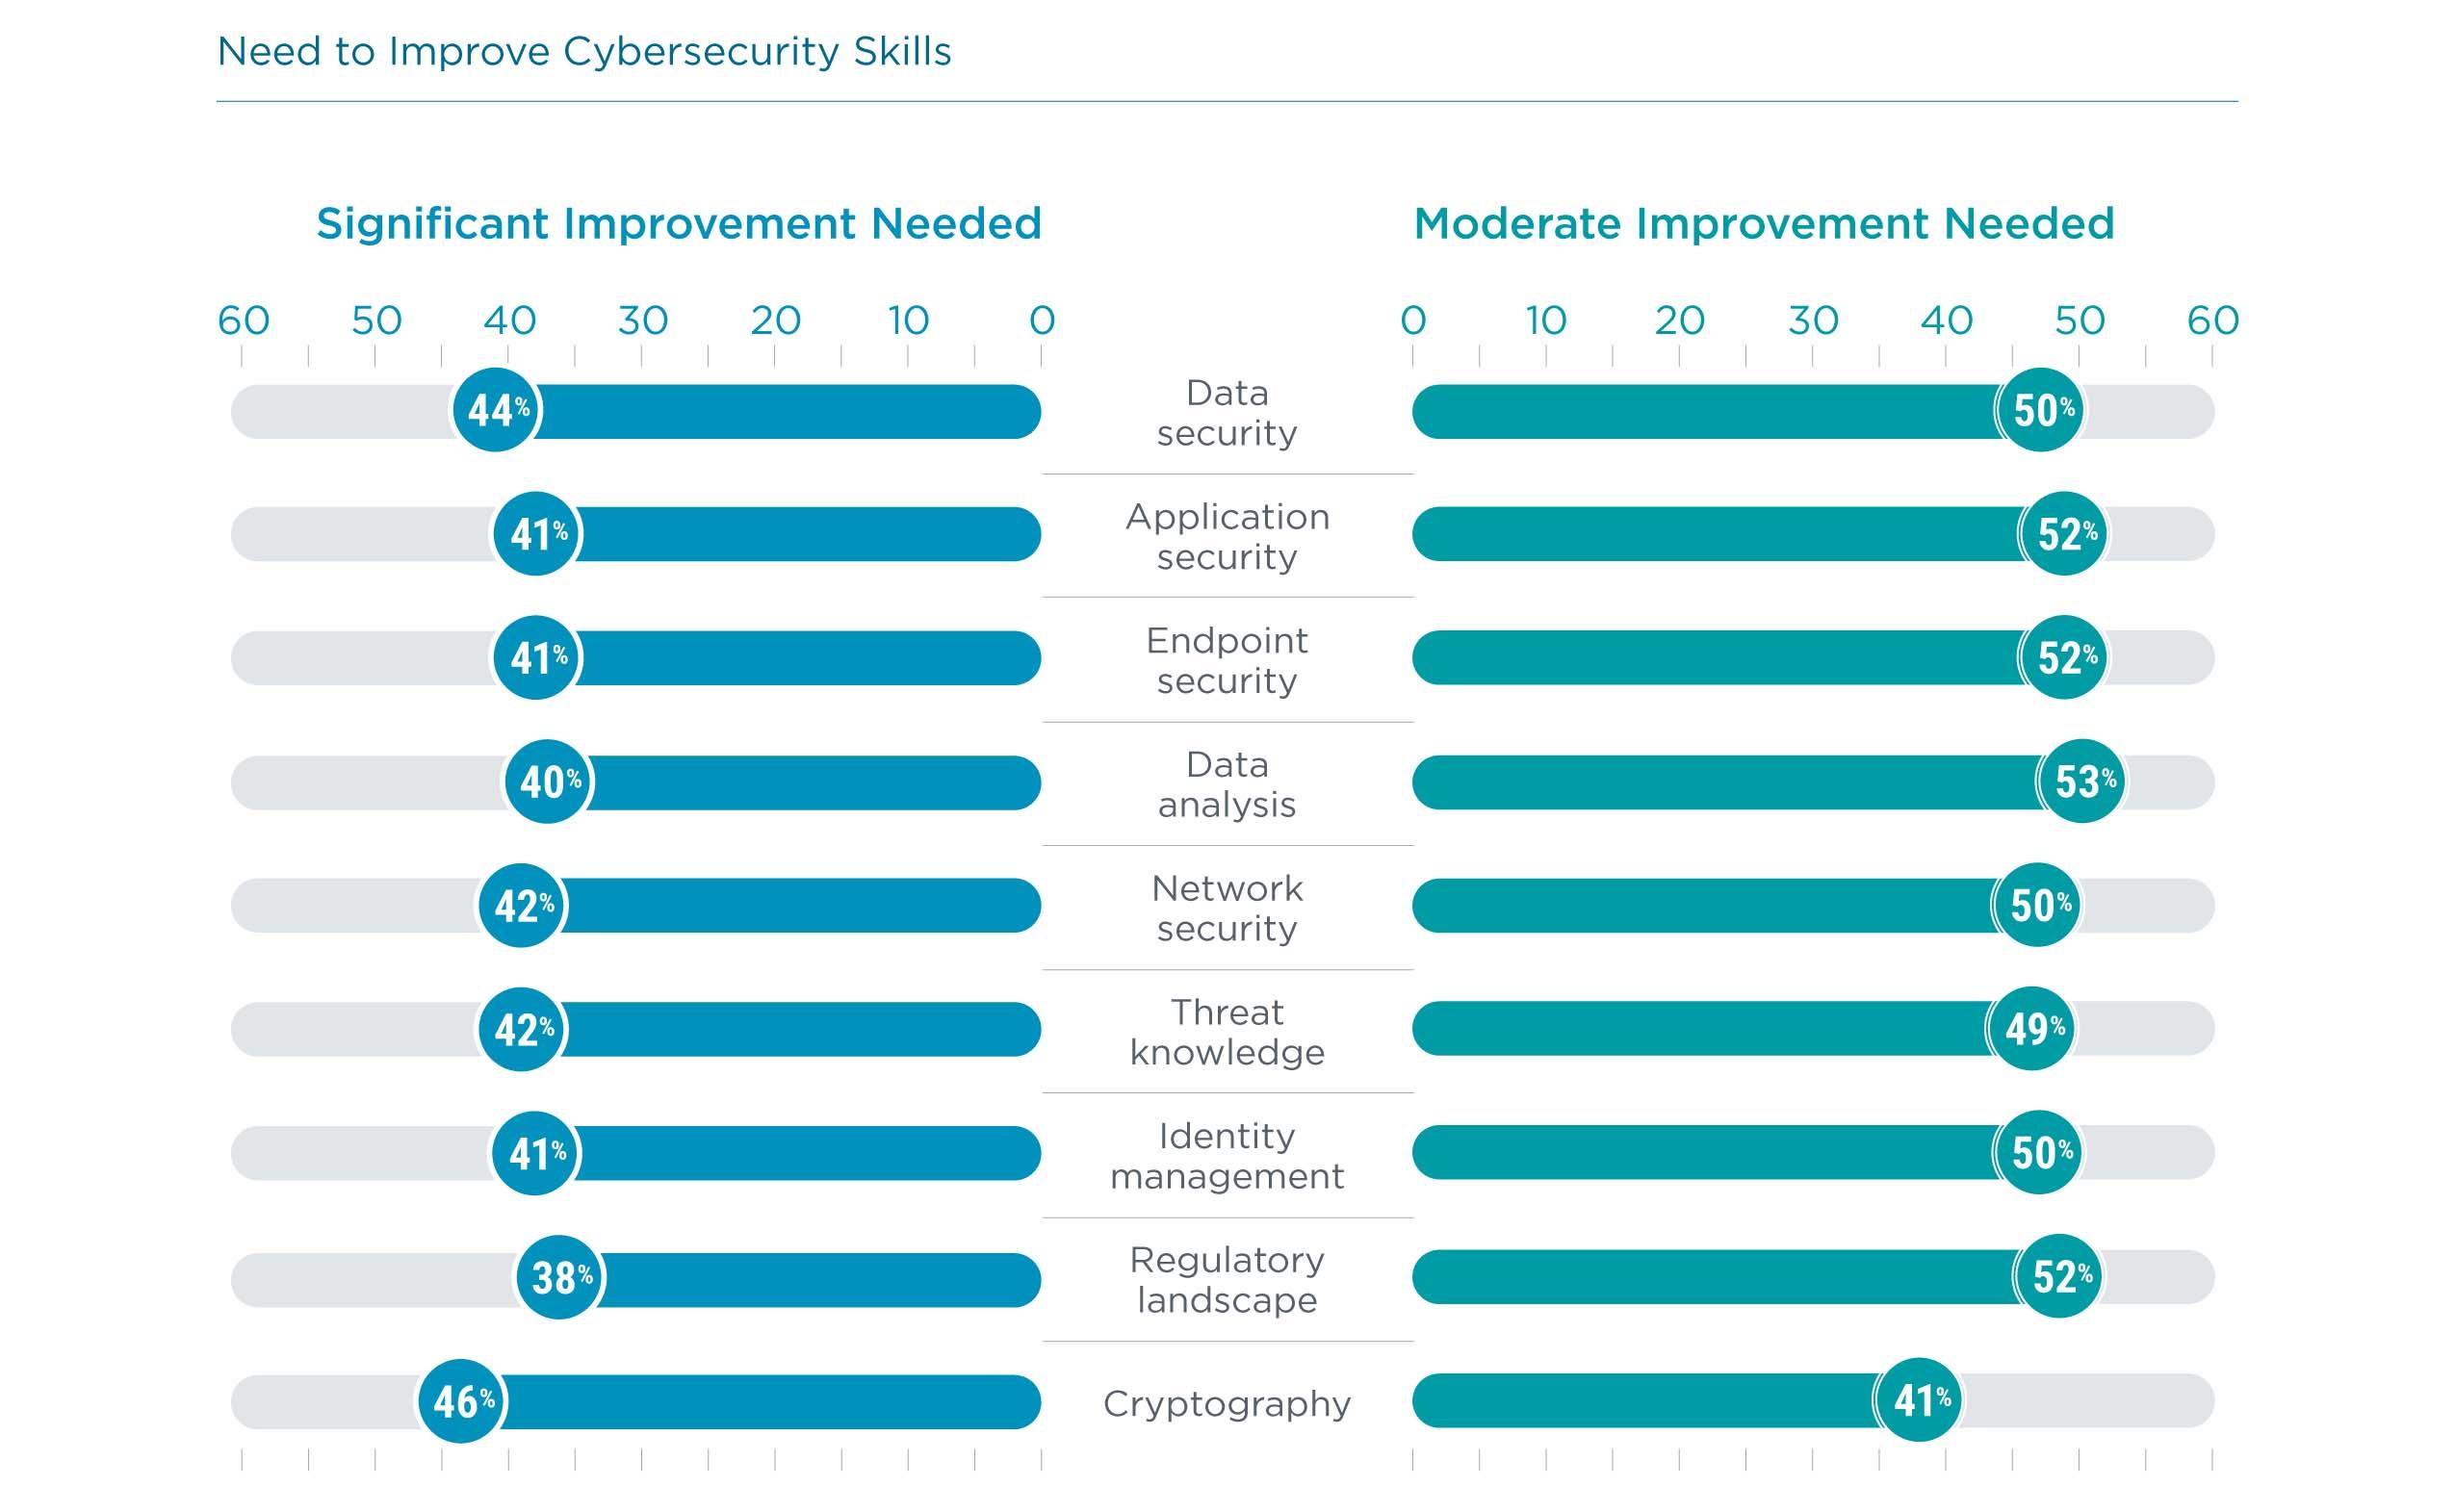 Need to Improve Cybersecurity Skills